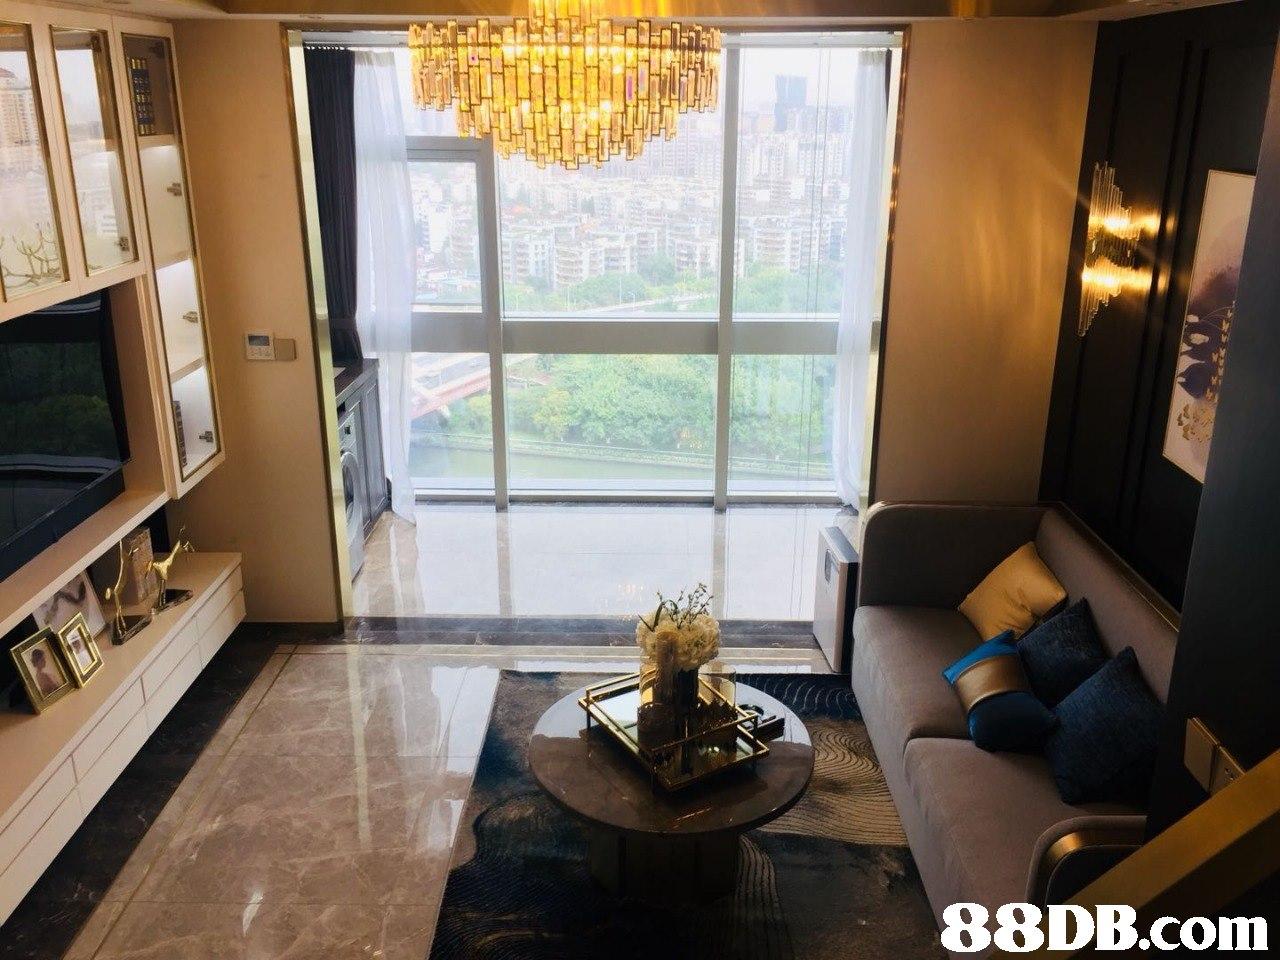 property,room,living room,interior design,window